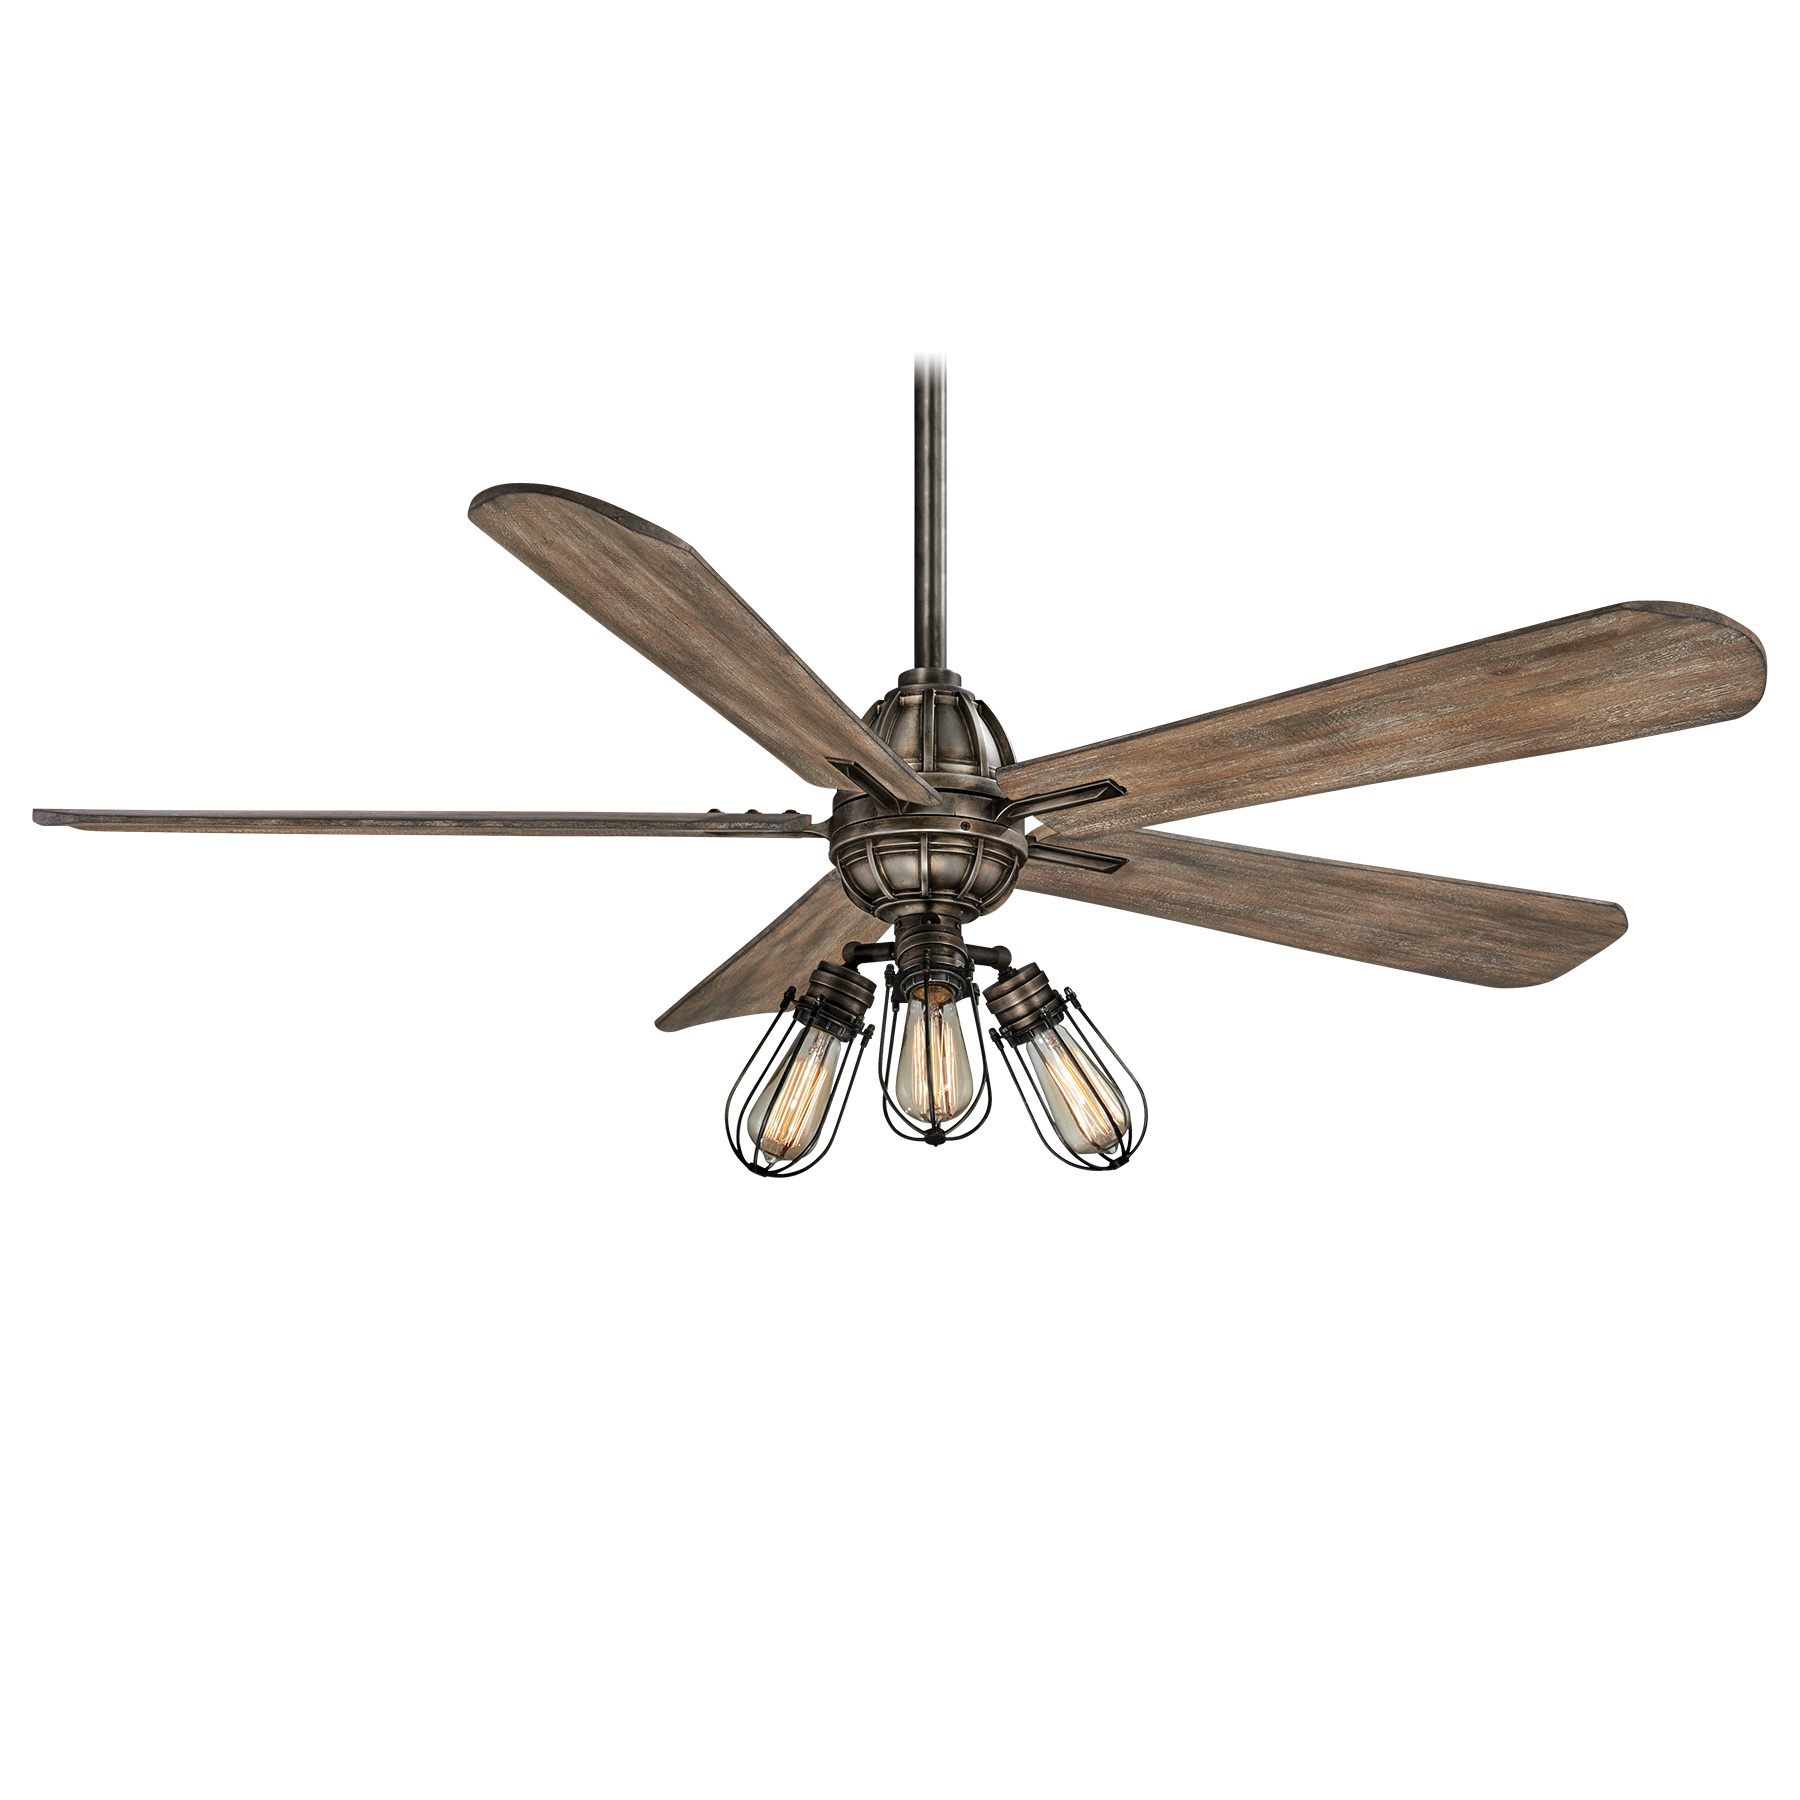 Minka Aire F852l Hbz Ceiling Fan With Light 56 Inch 5 Blade Heirloom Bronze Alva